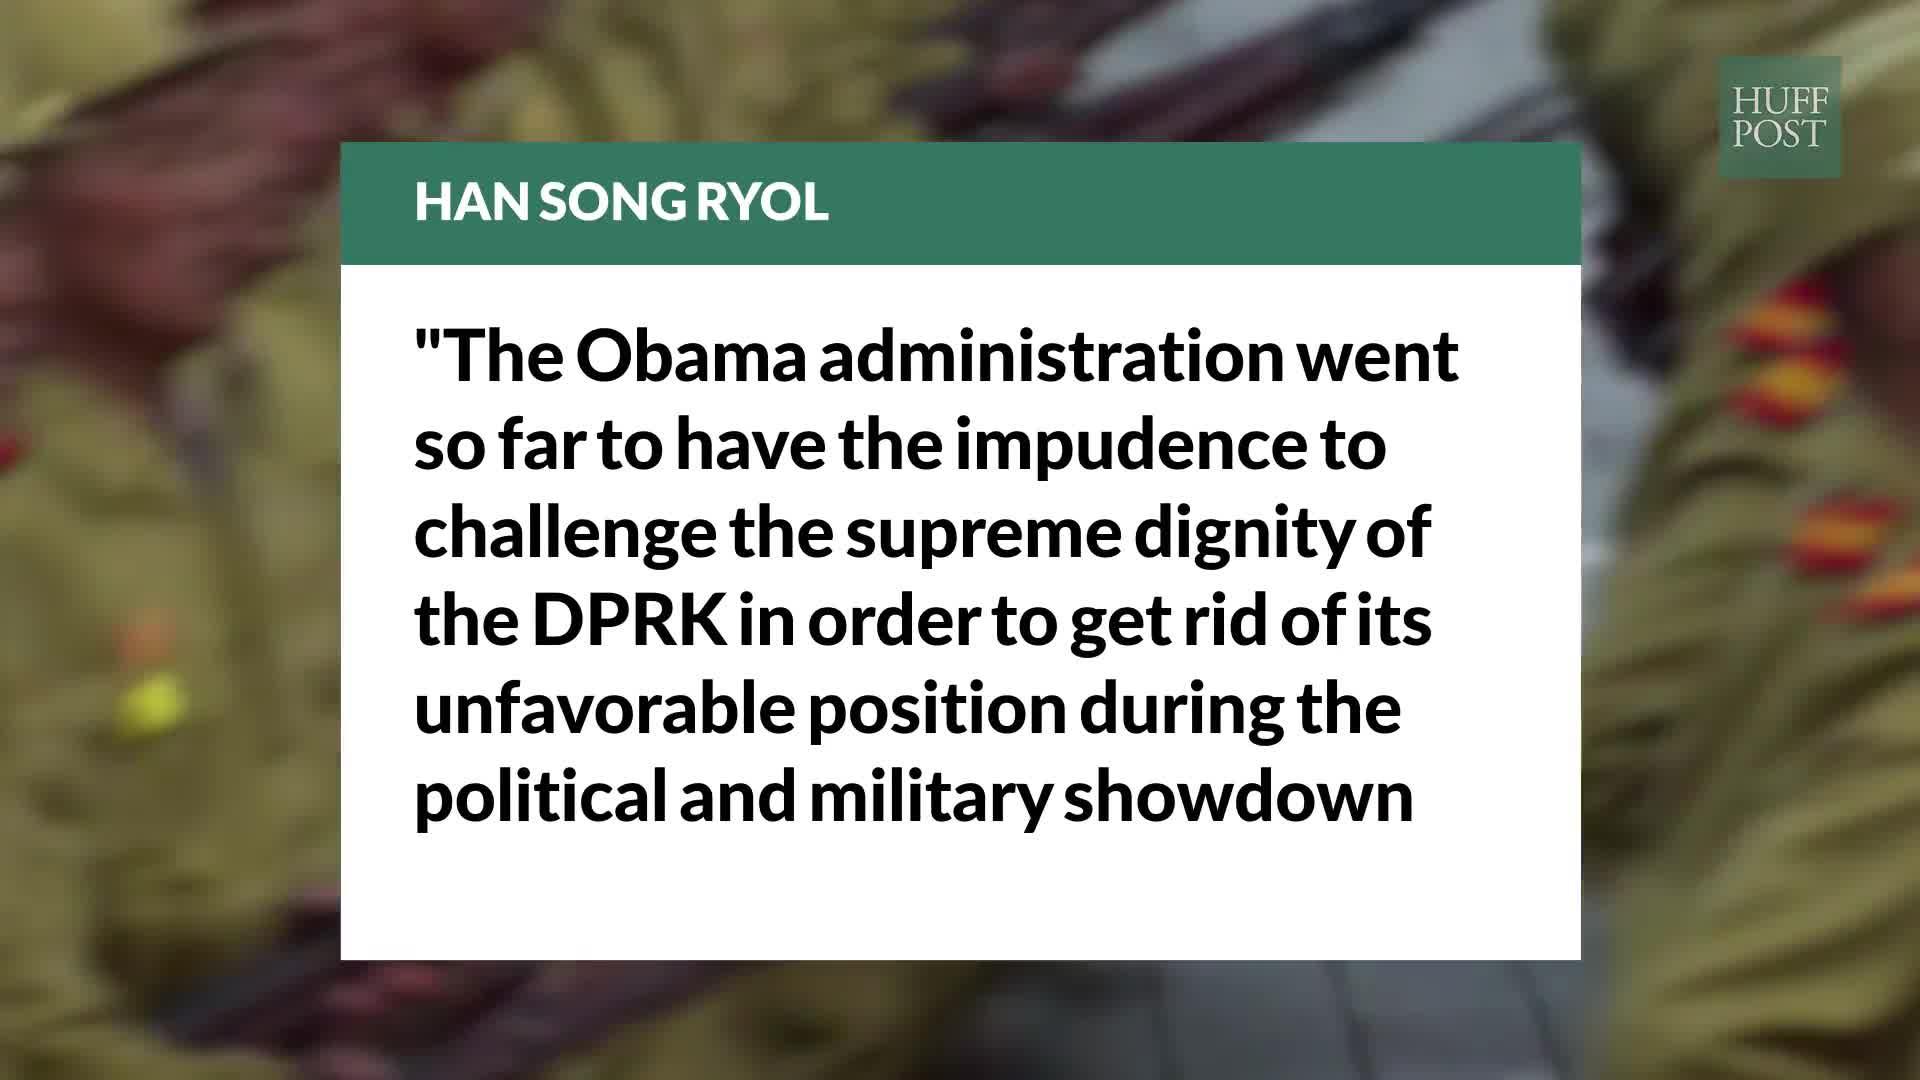 North Korea 'Declares War' On The USA, People Respond With Meme Warfare